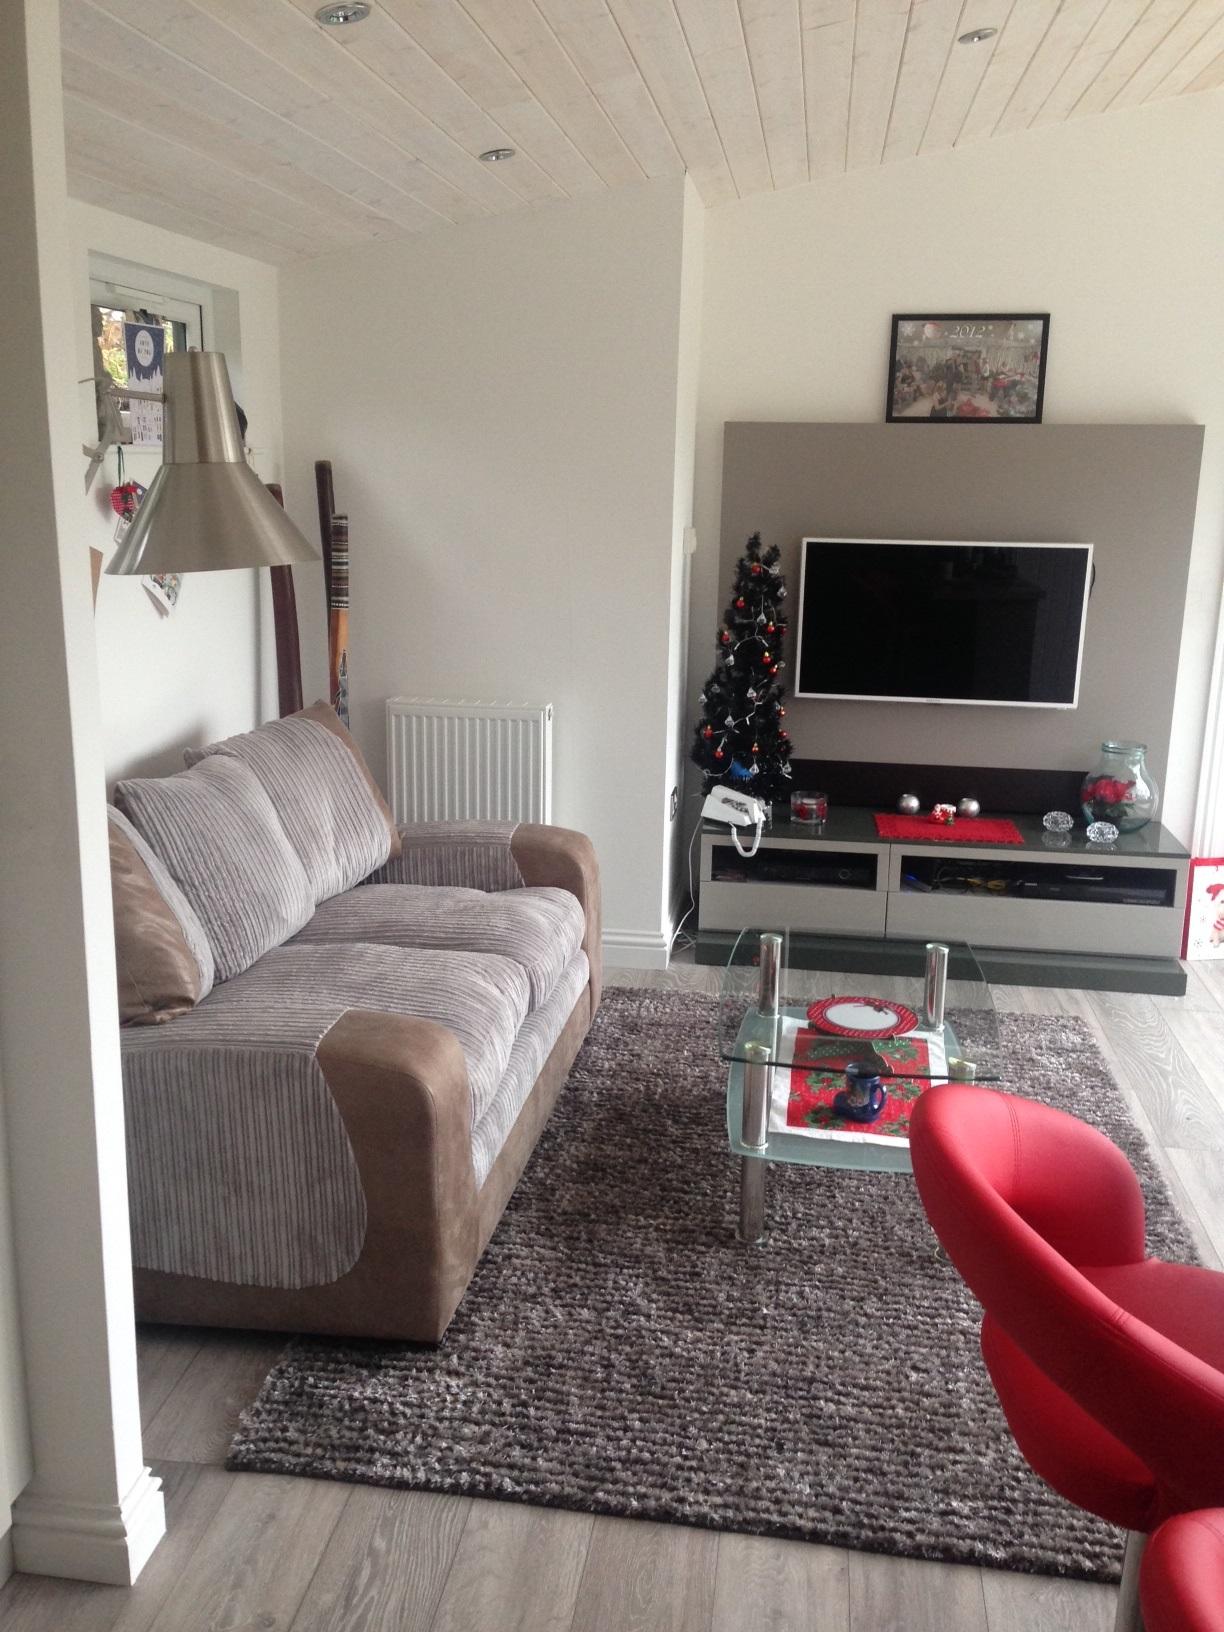 Slimline Bedroom Furniture Buy A Two Bedroom Bespoke Lodge